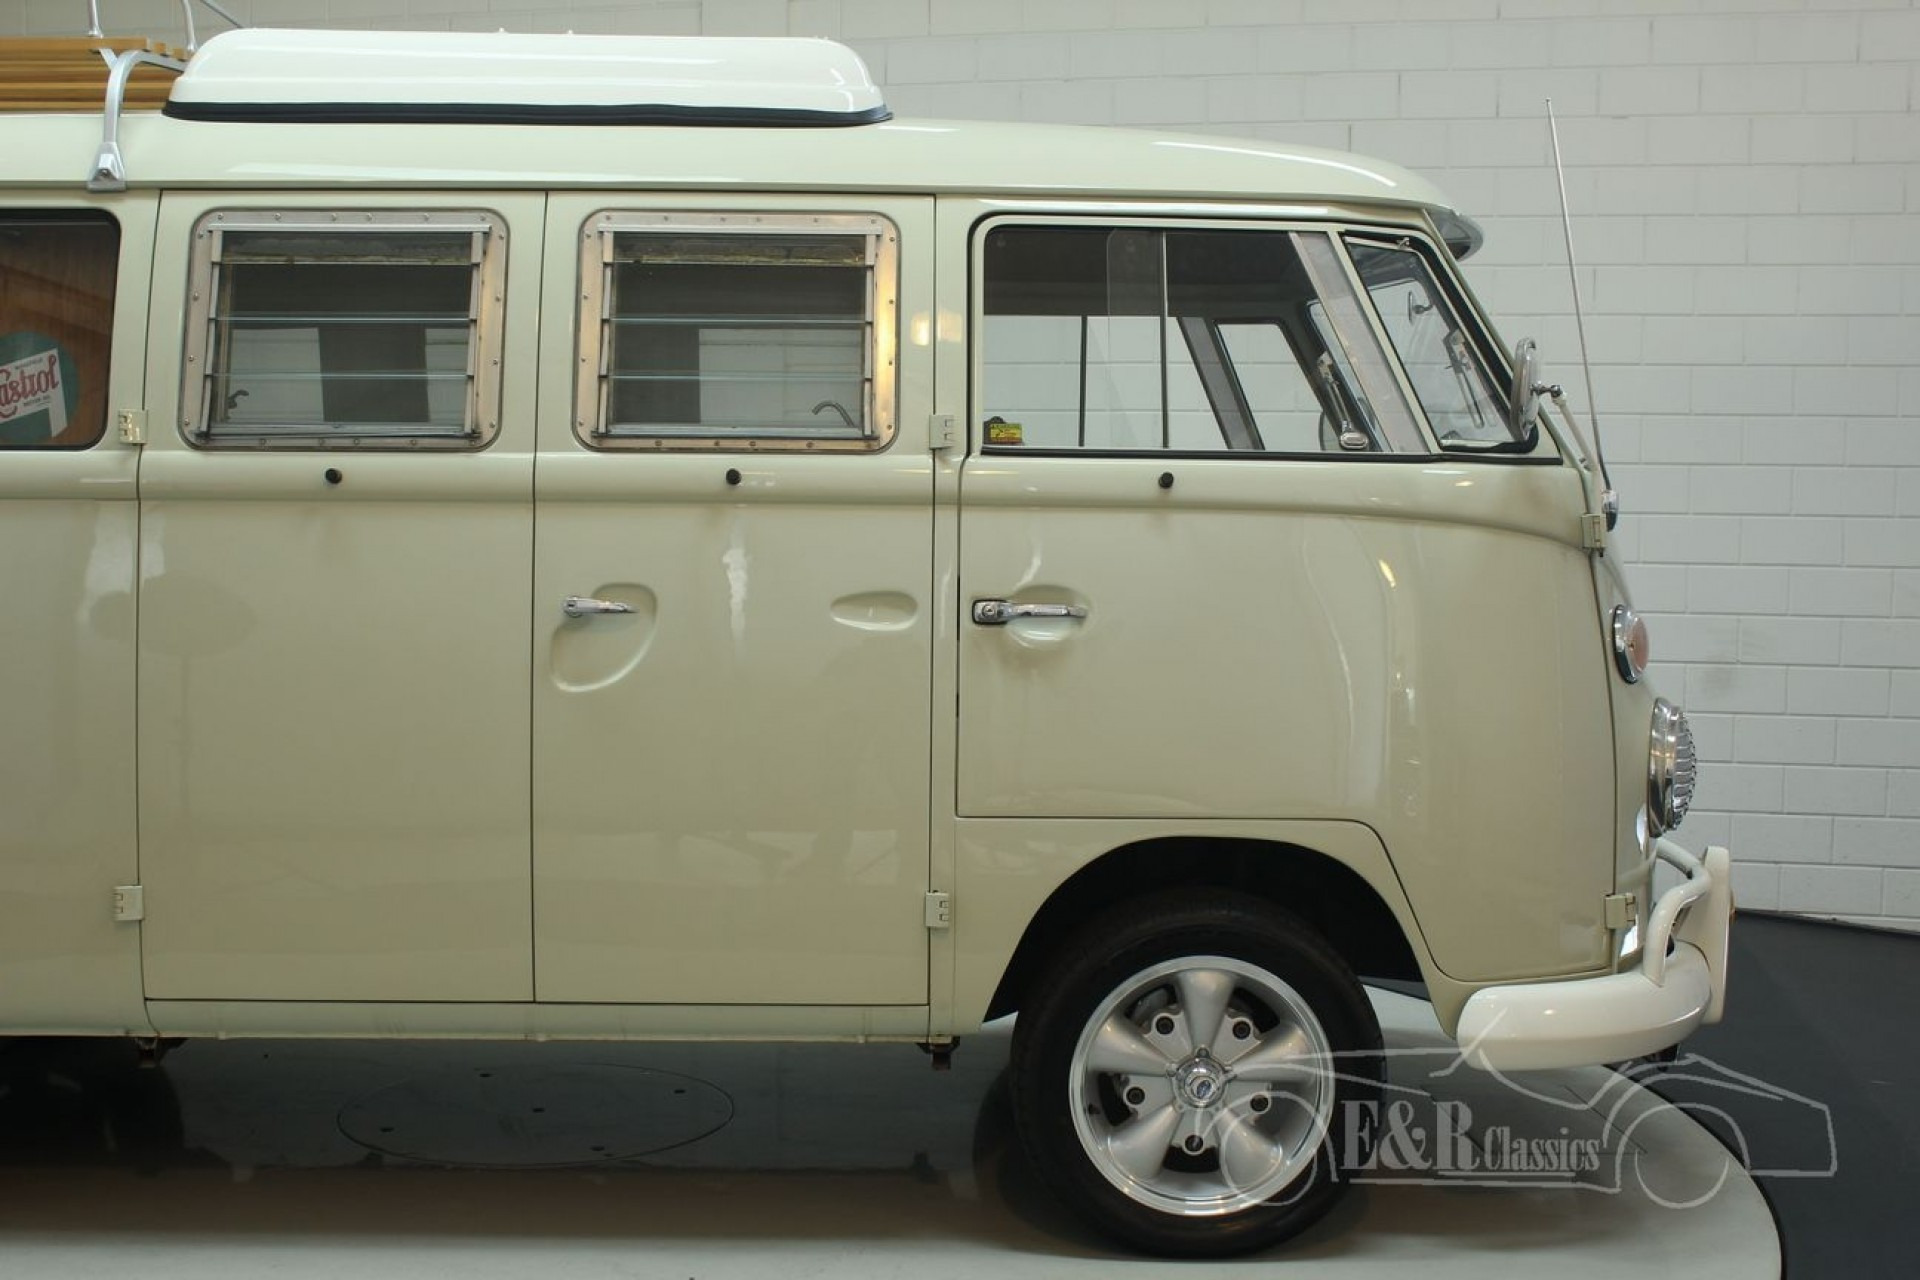 VW T1 Westfalia 1966 for sale at Erclassics